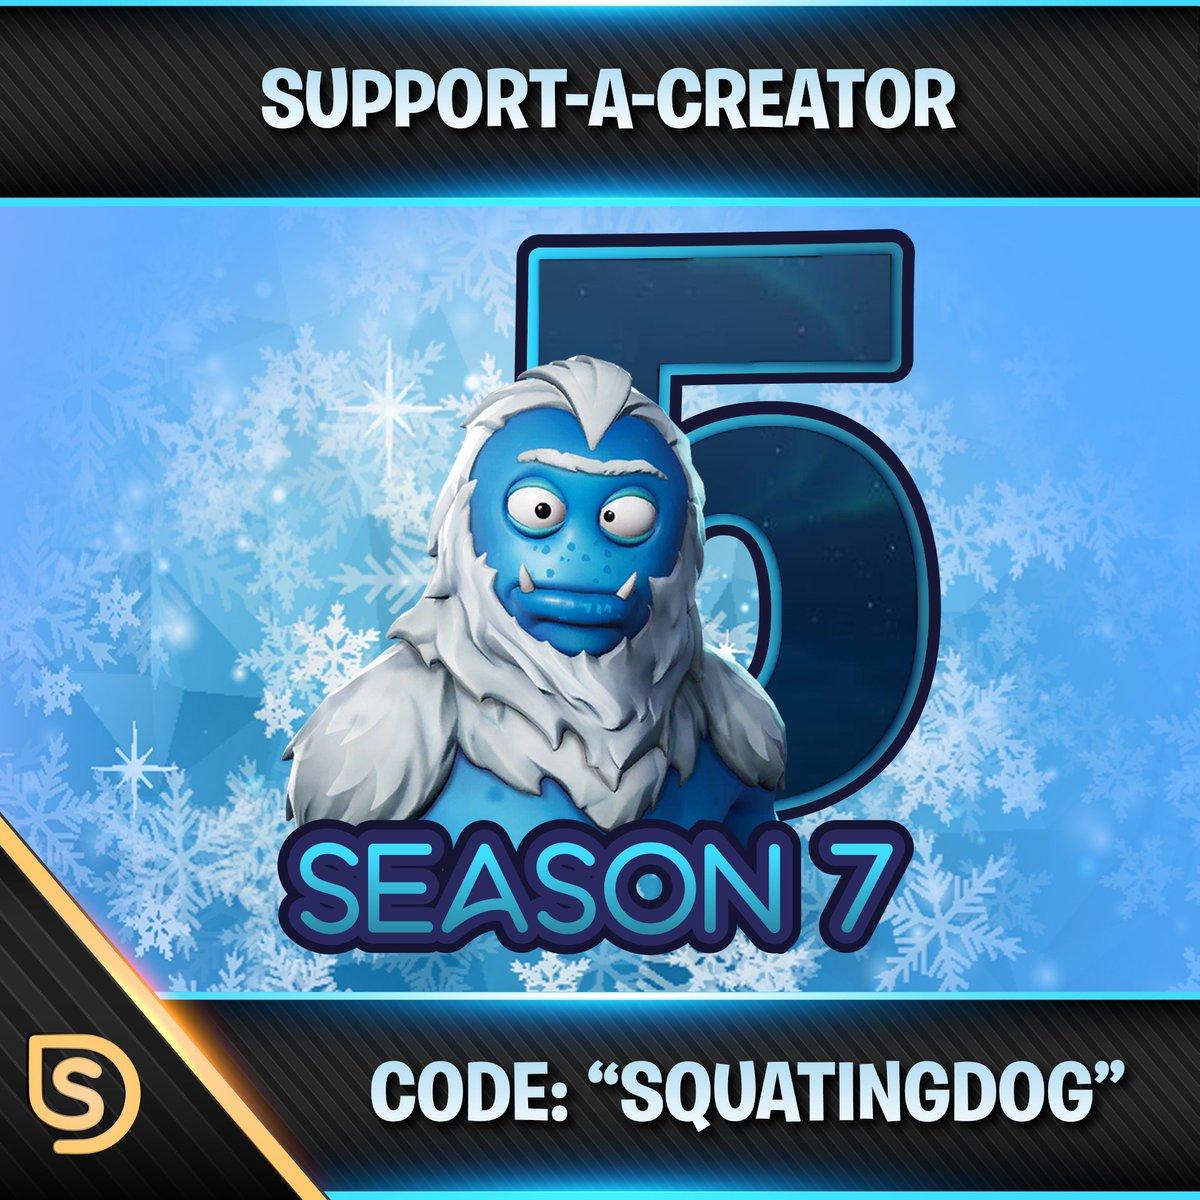 Squatingdog Thesquatingdog Twitter